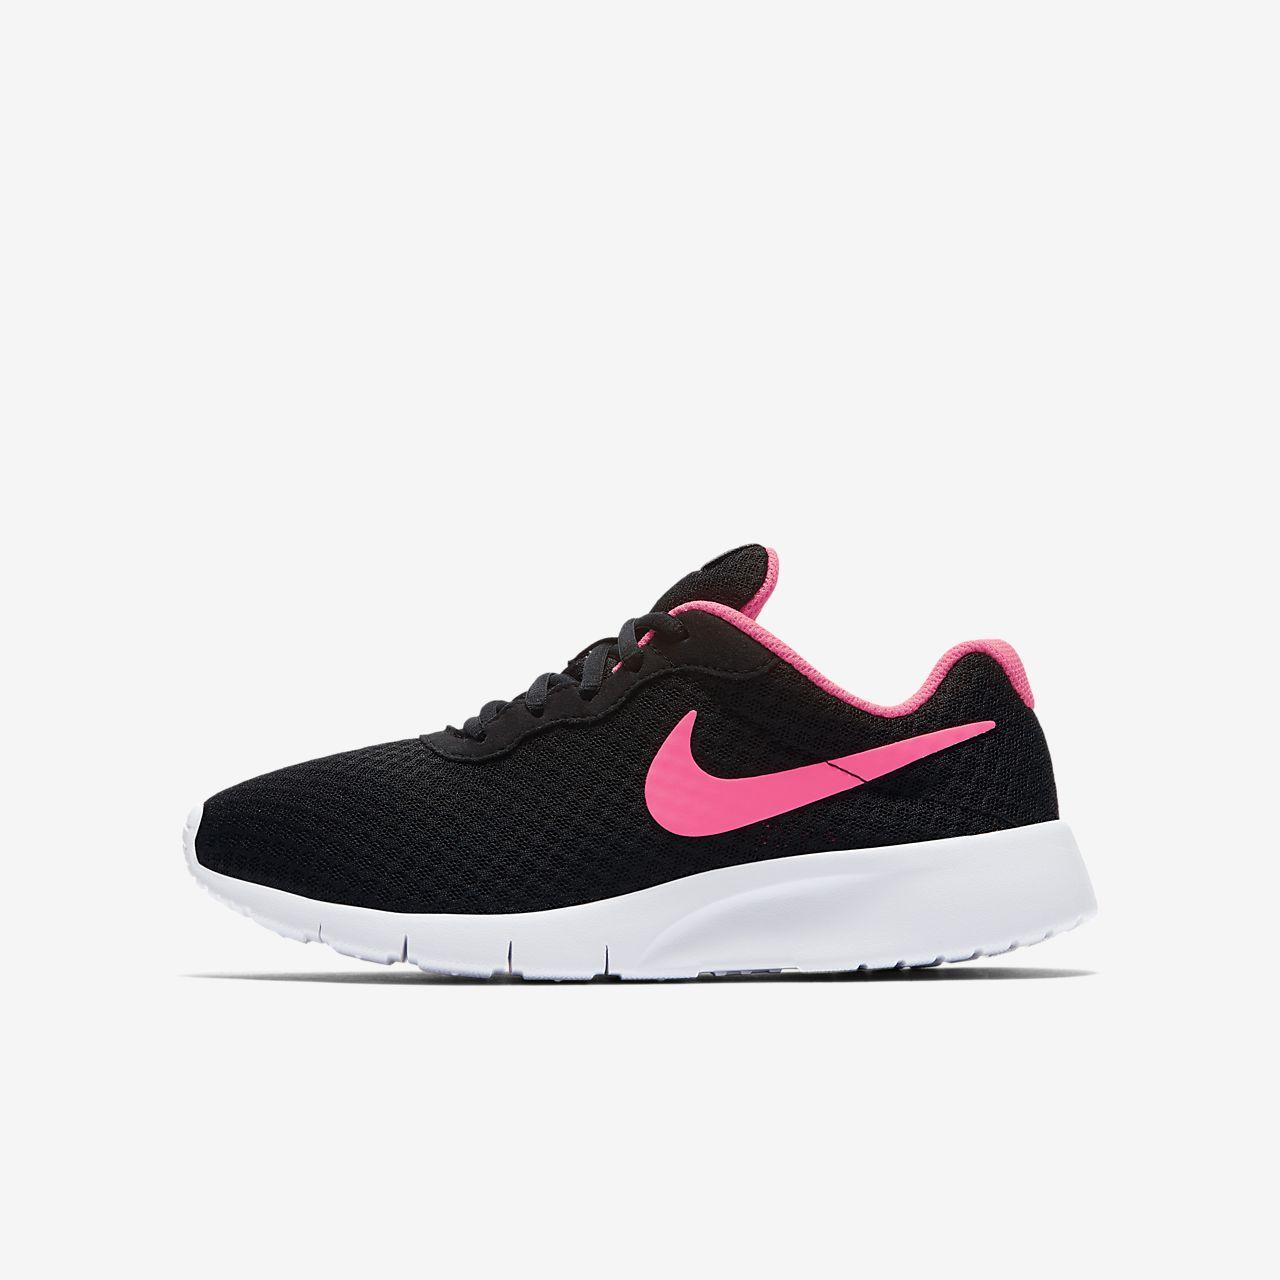 fd79a8ff85f Nike Tanjun Older Kids  Shoe. Nike.com GB